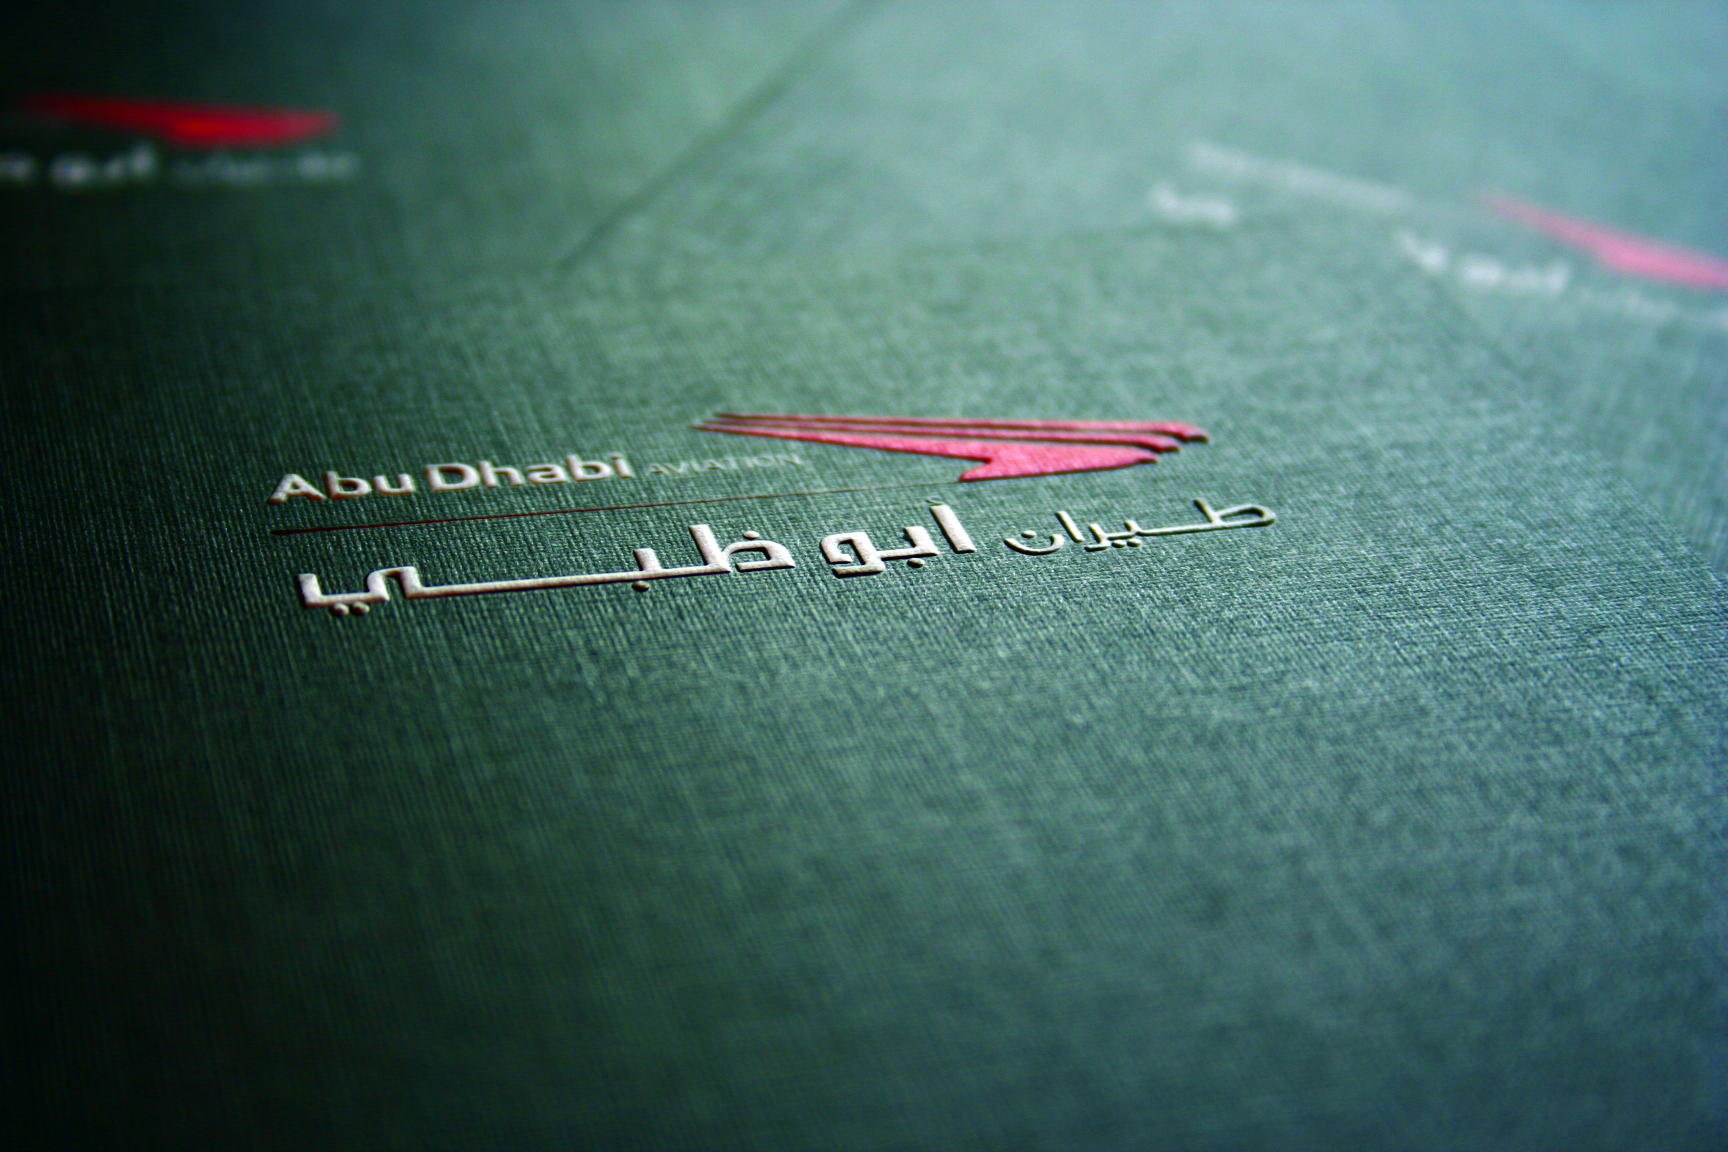 Abudhabi aviation Branding